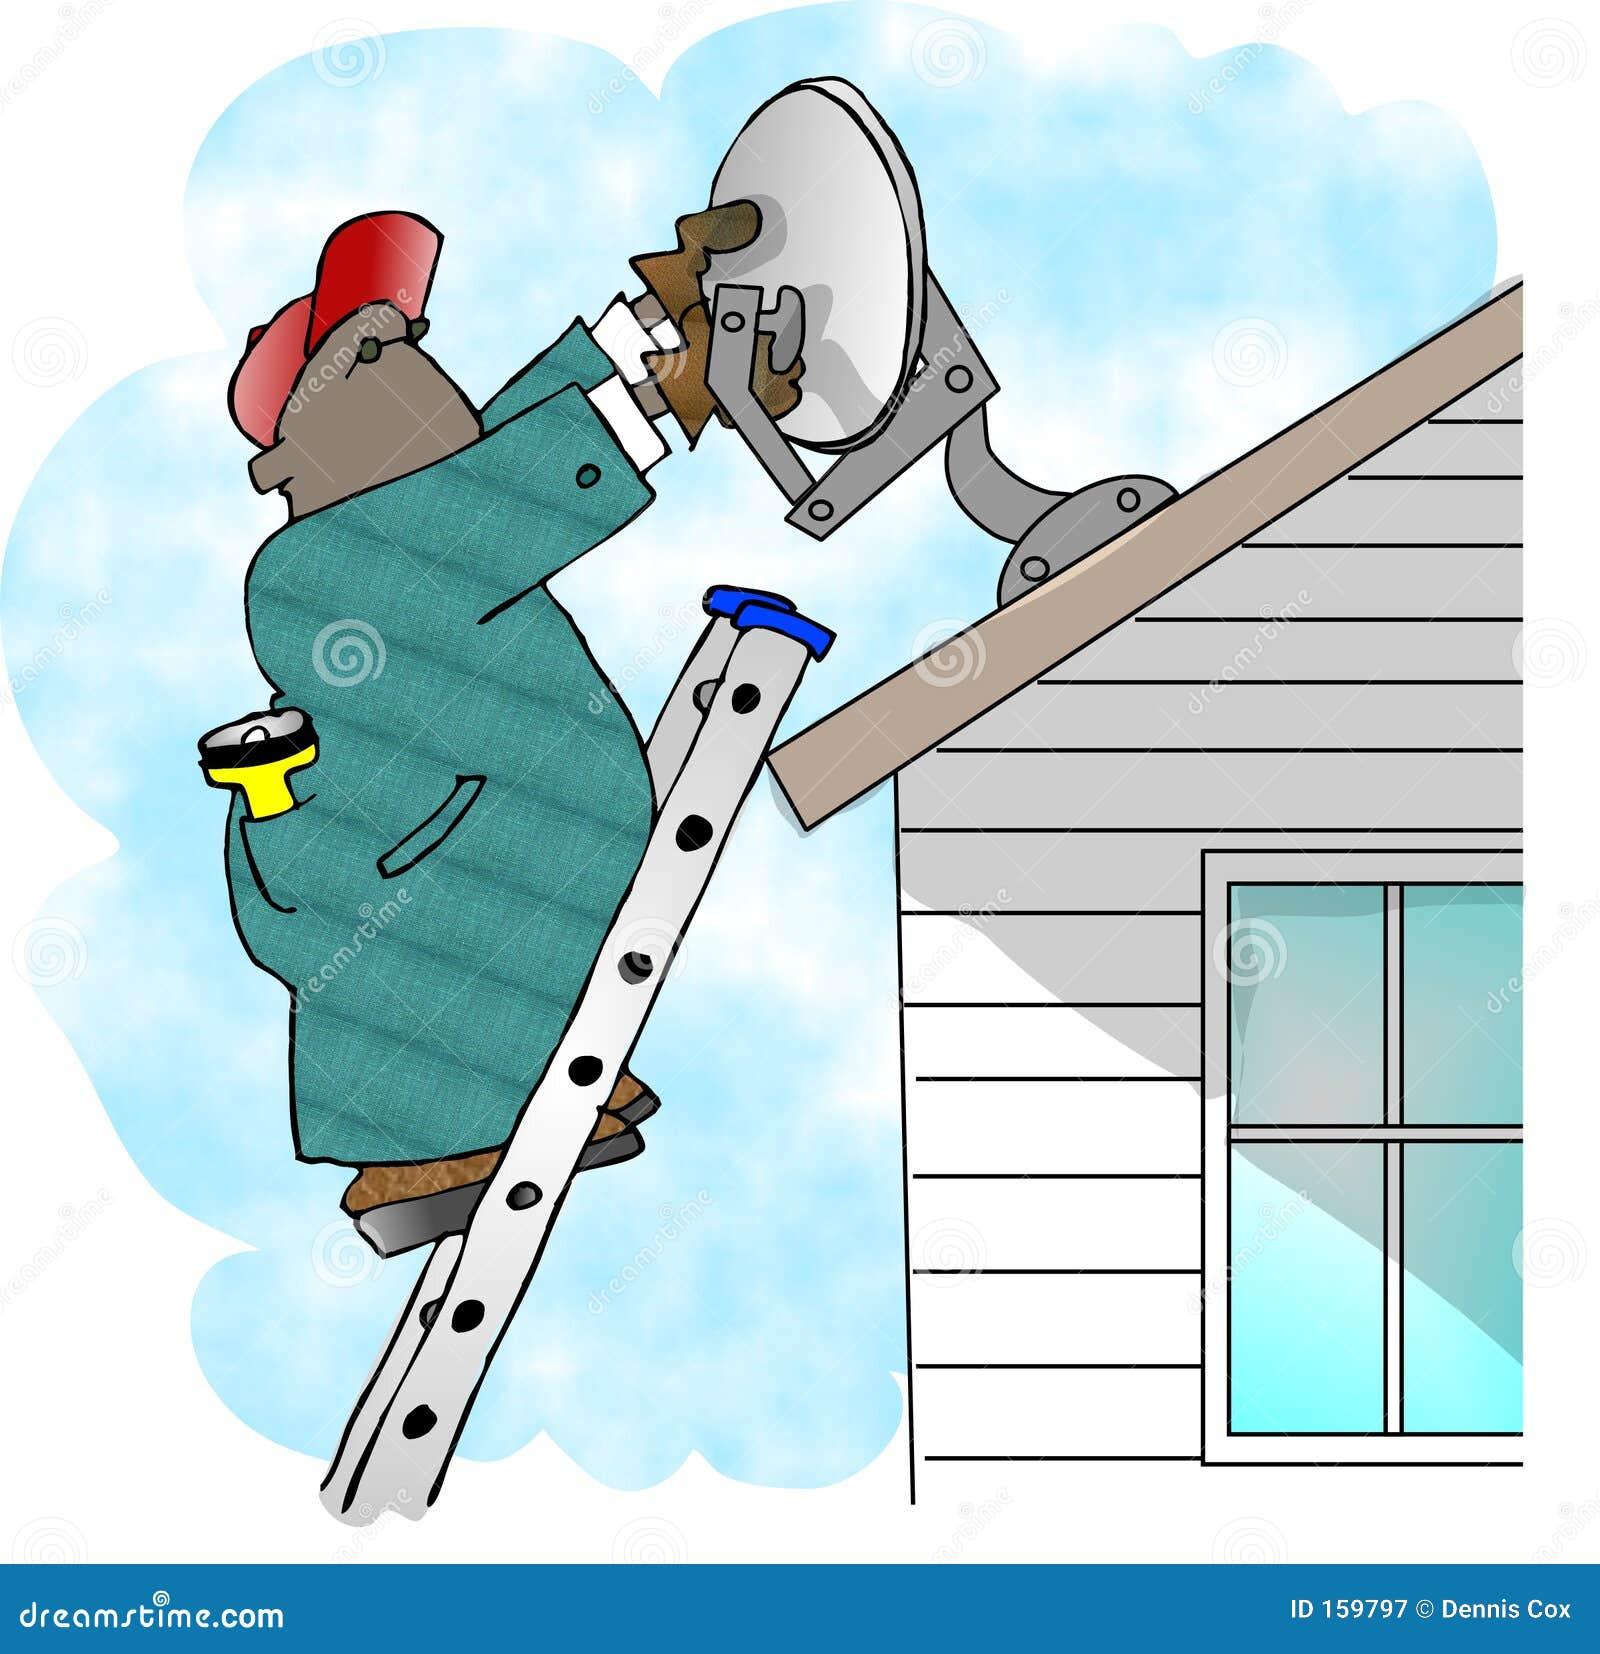 Satellite Dish Technician ad agency account executive cover letter – Satellite Dish Technician